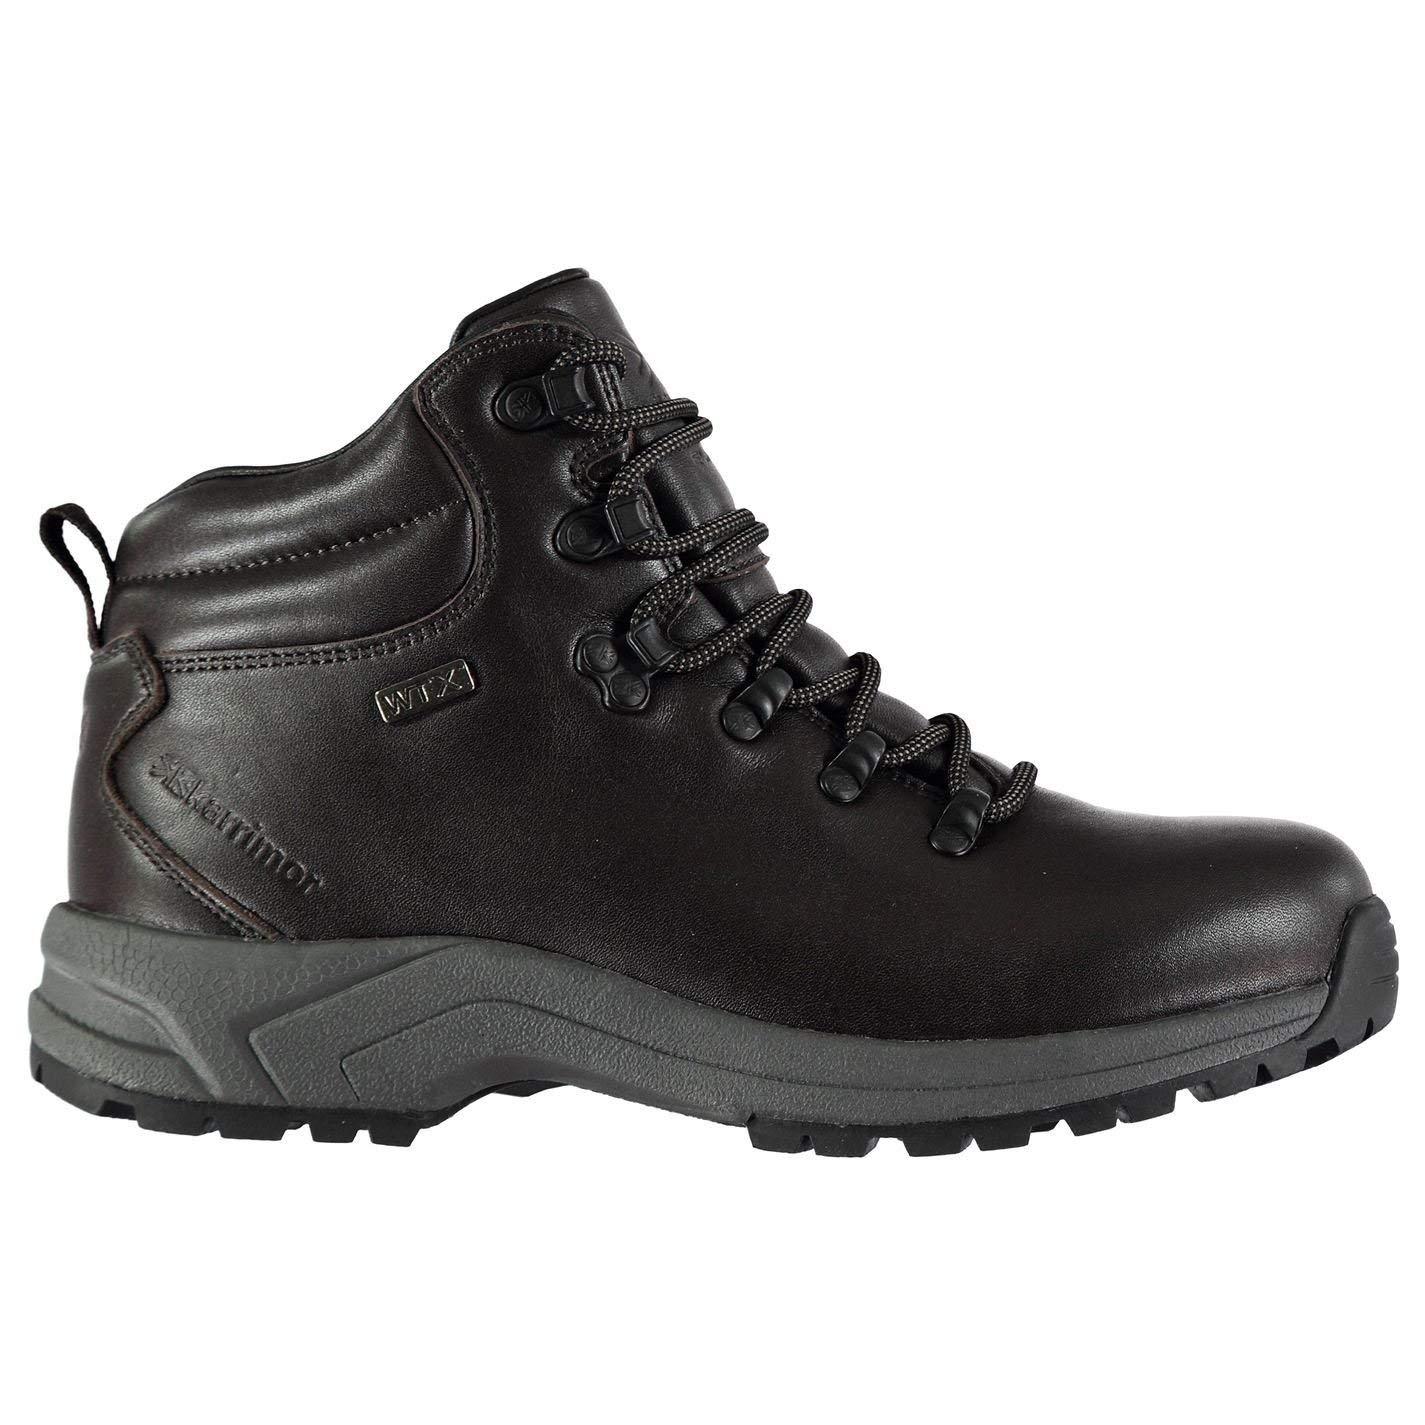 Direct Karrimor Walking Boots